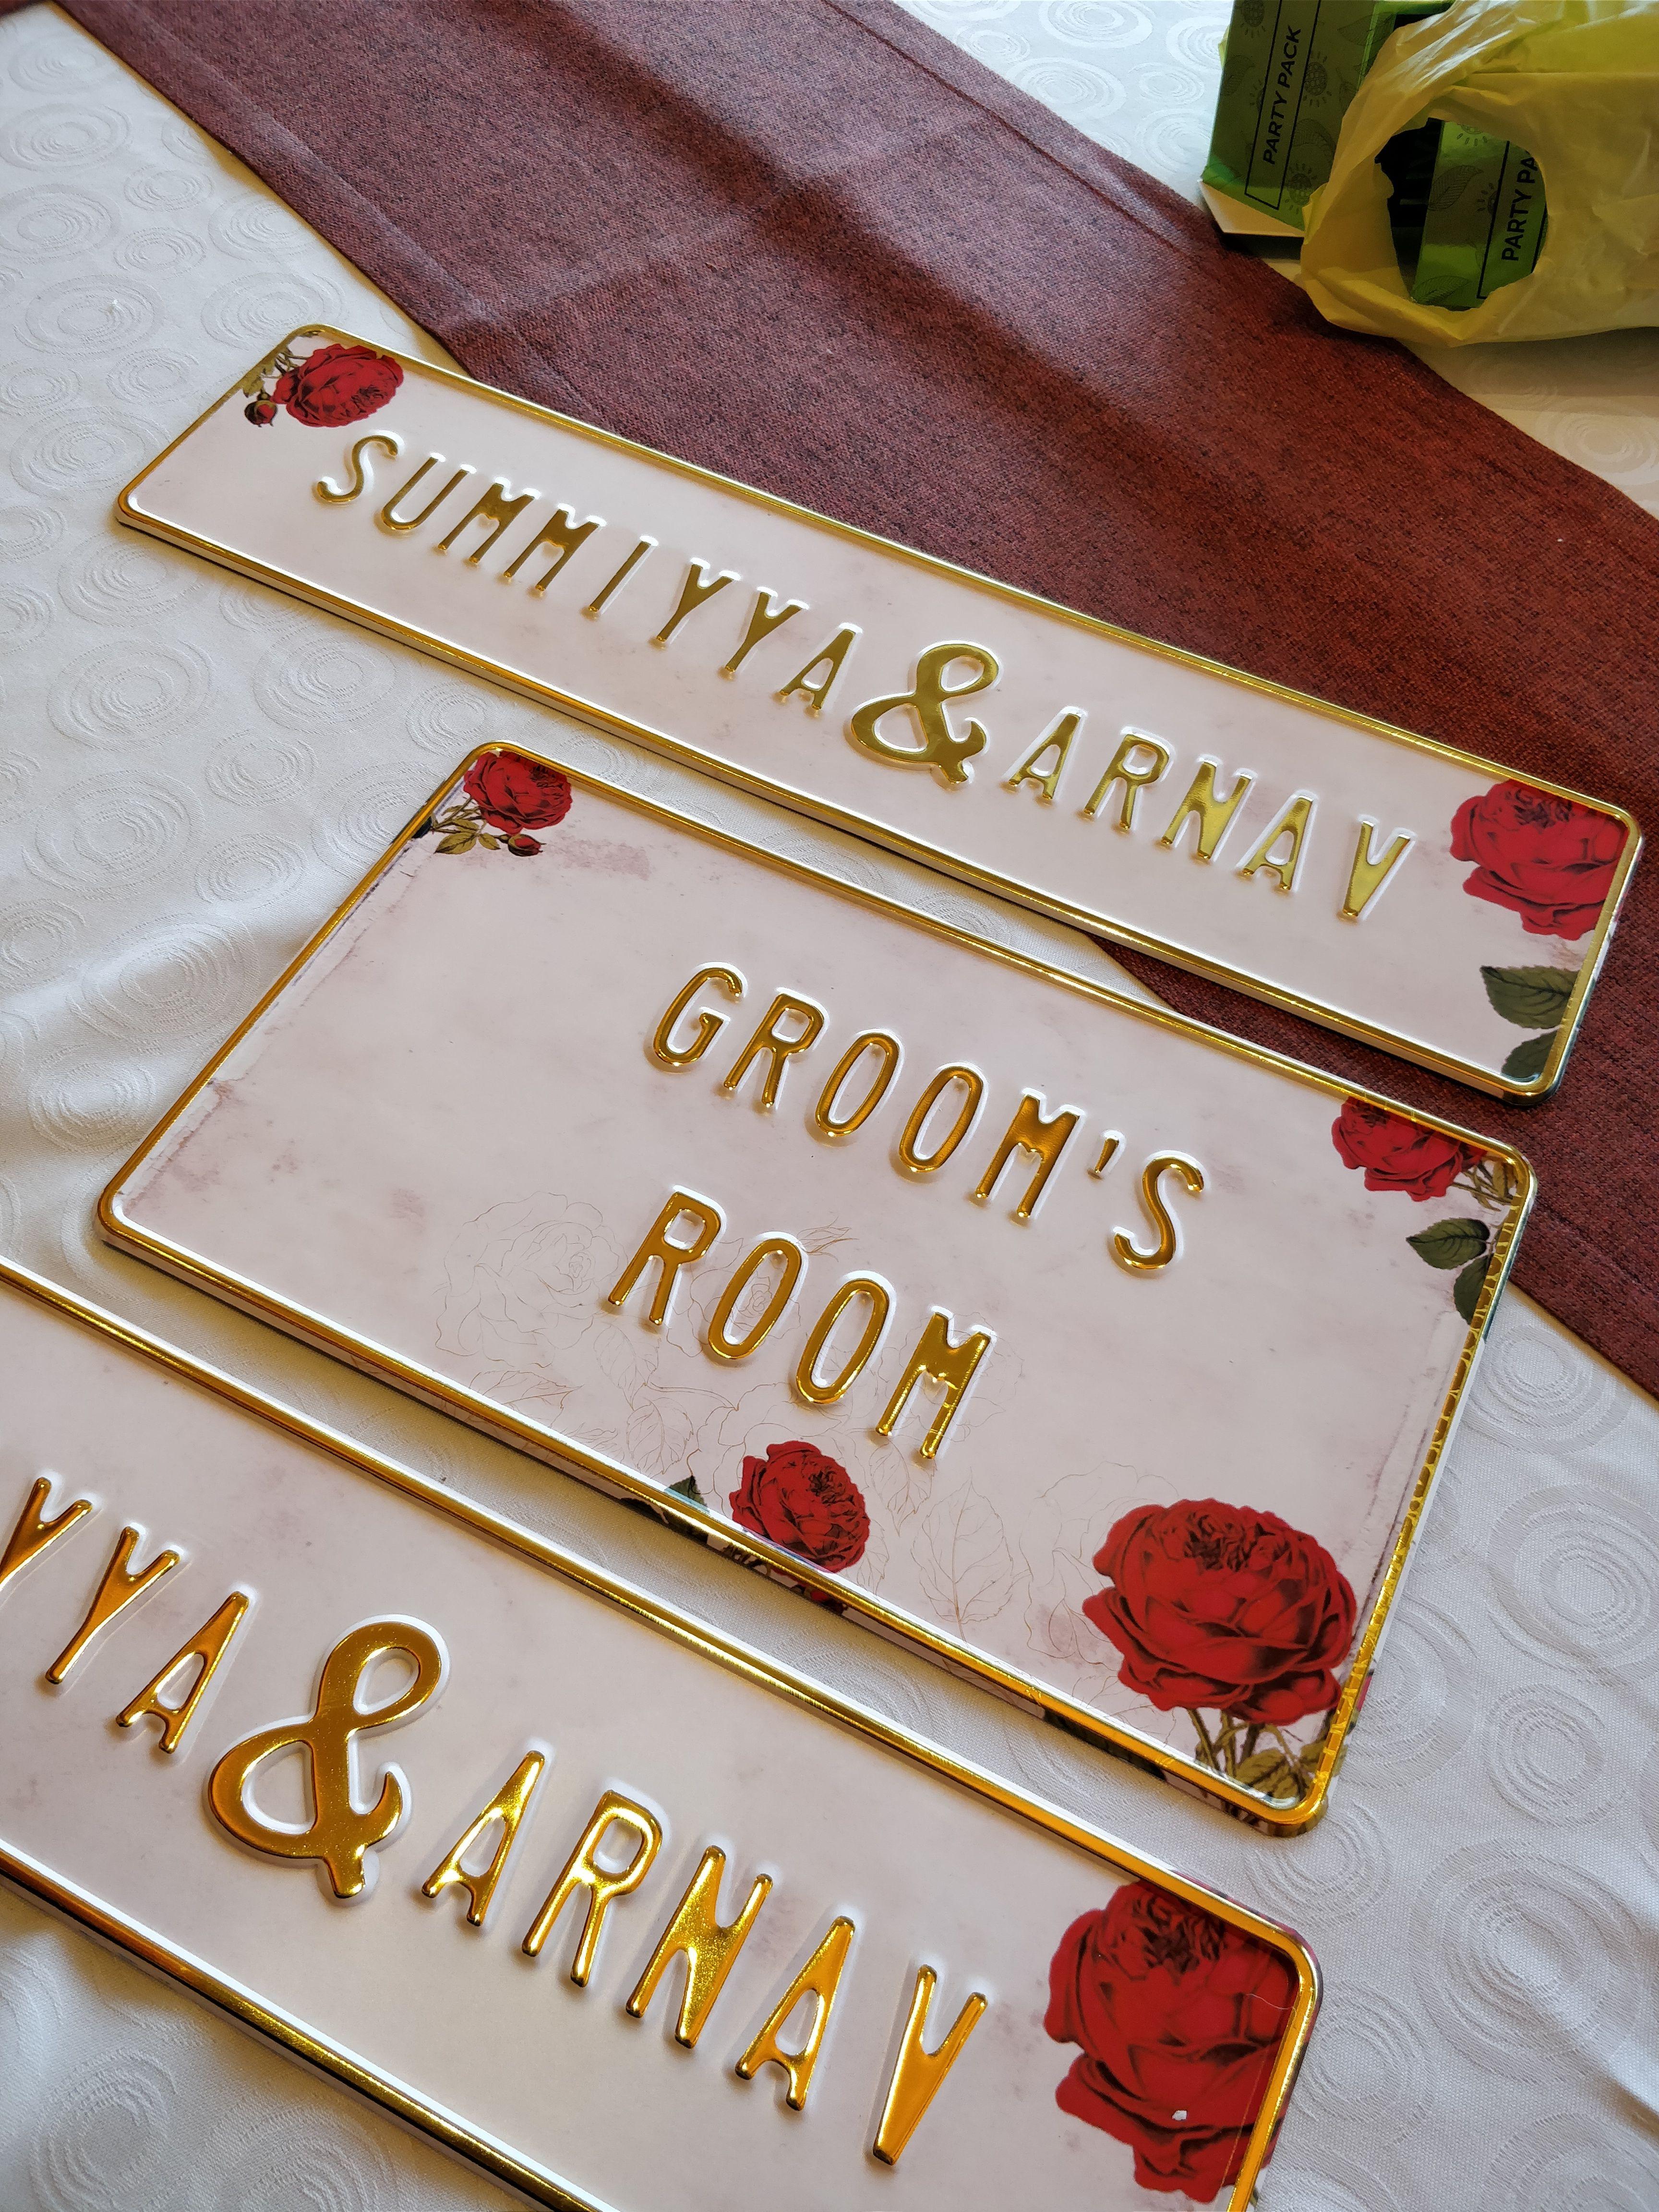 Modern Indian Wedding Decor Bride & Groom Personalised